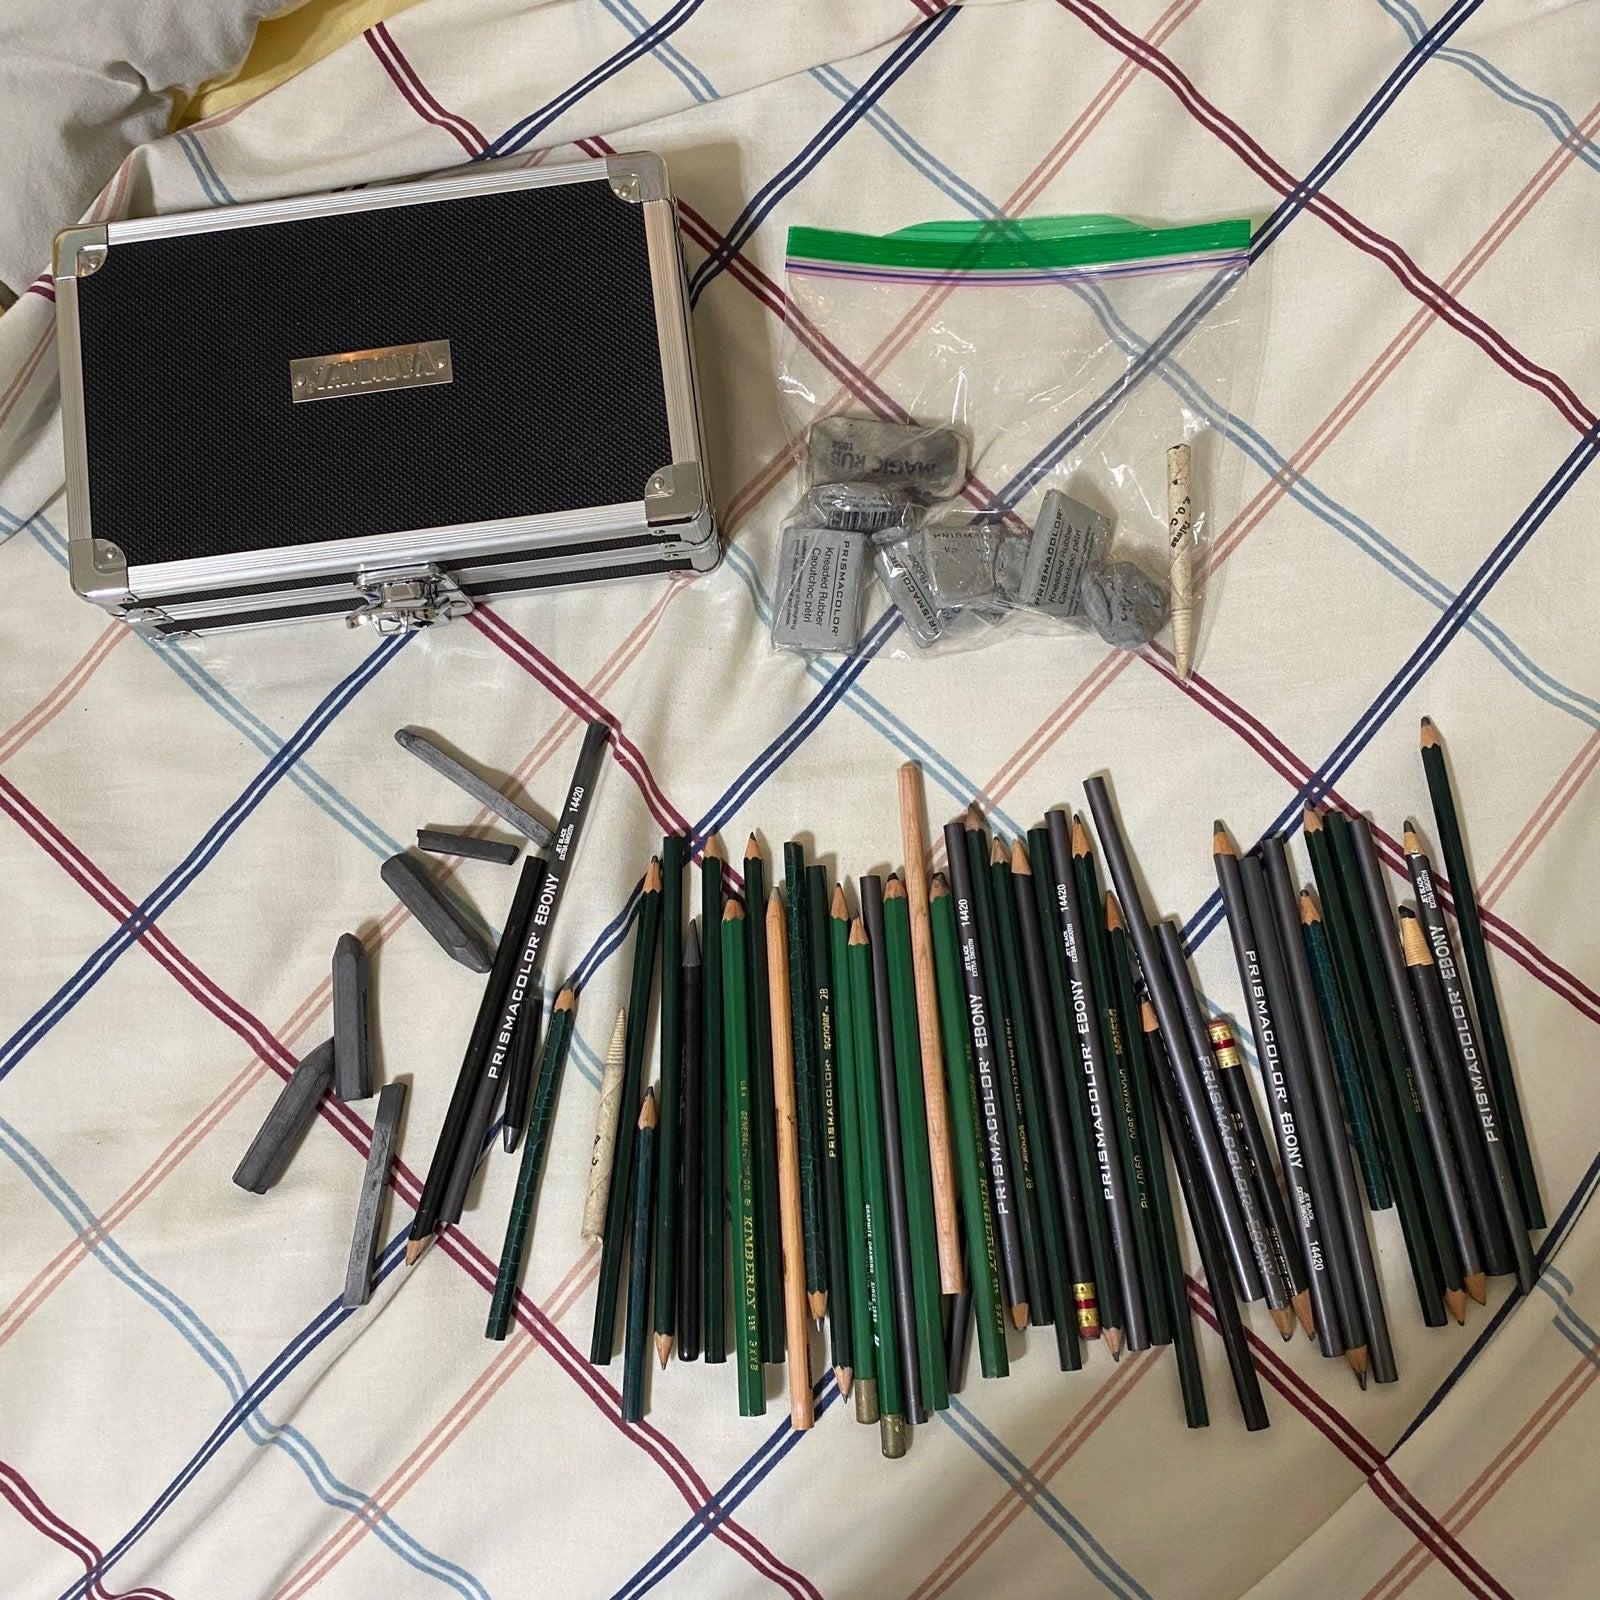 Graphite Pencils, Erasers, and Box